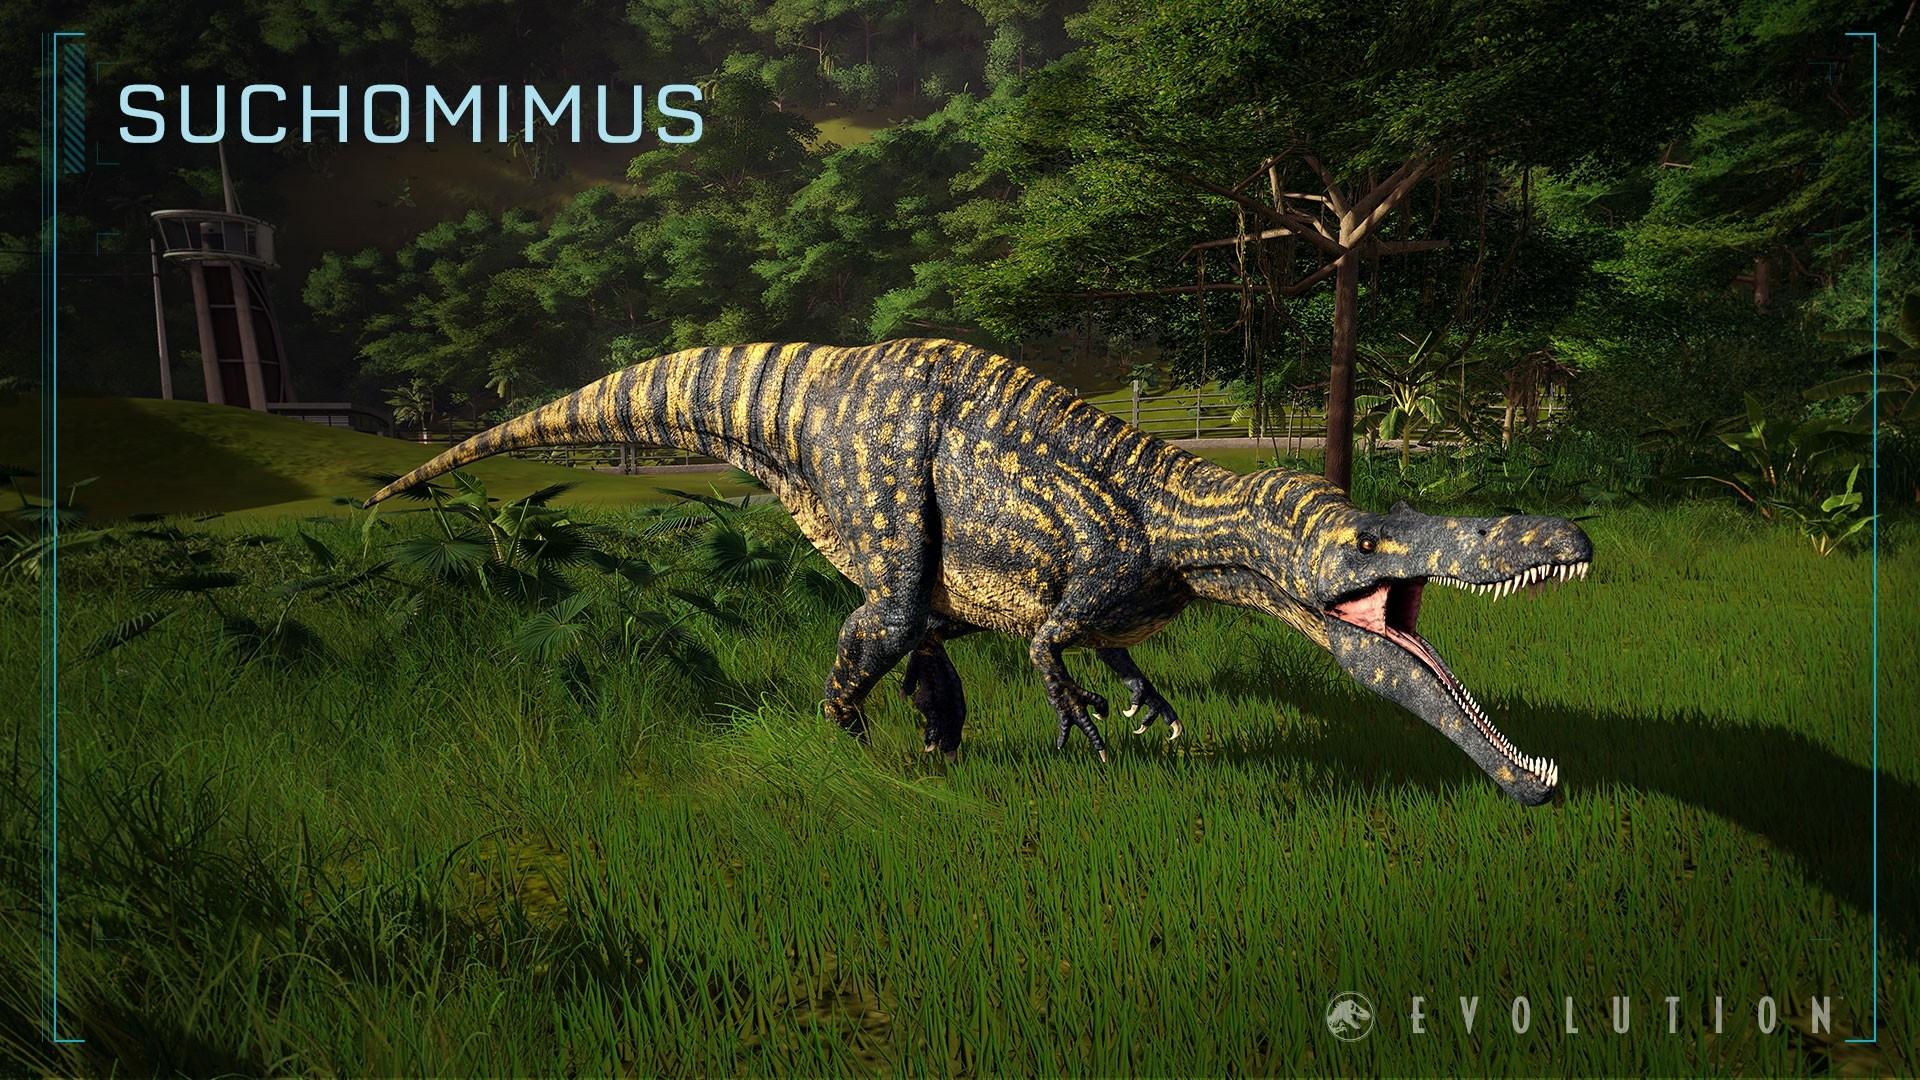 Suchomimus jw e jurassic park wiki fandom powered by wikia - Dinosaure de jurassic park ...